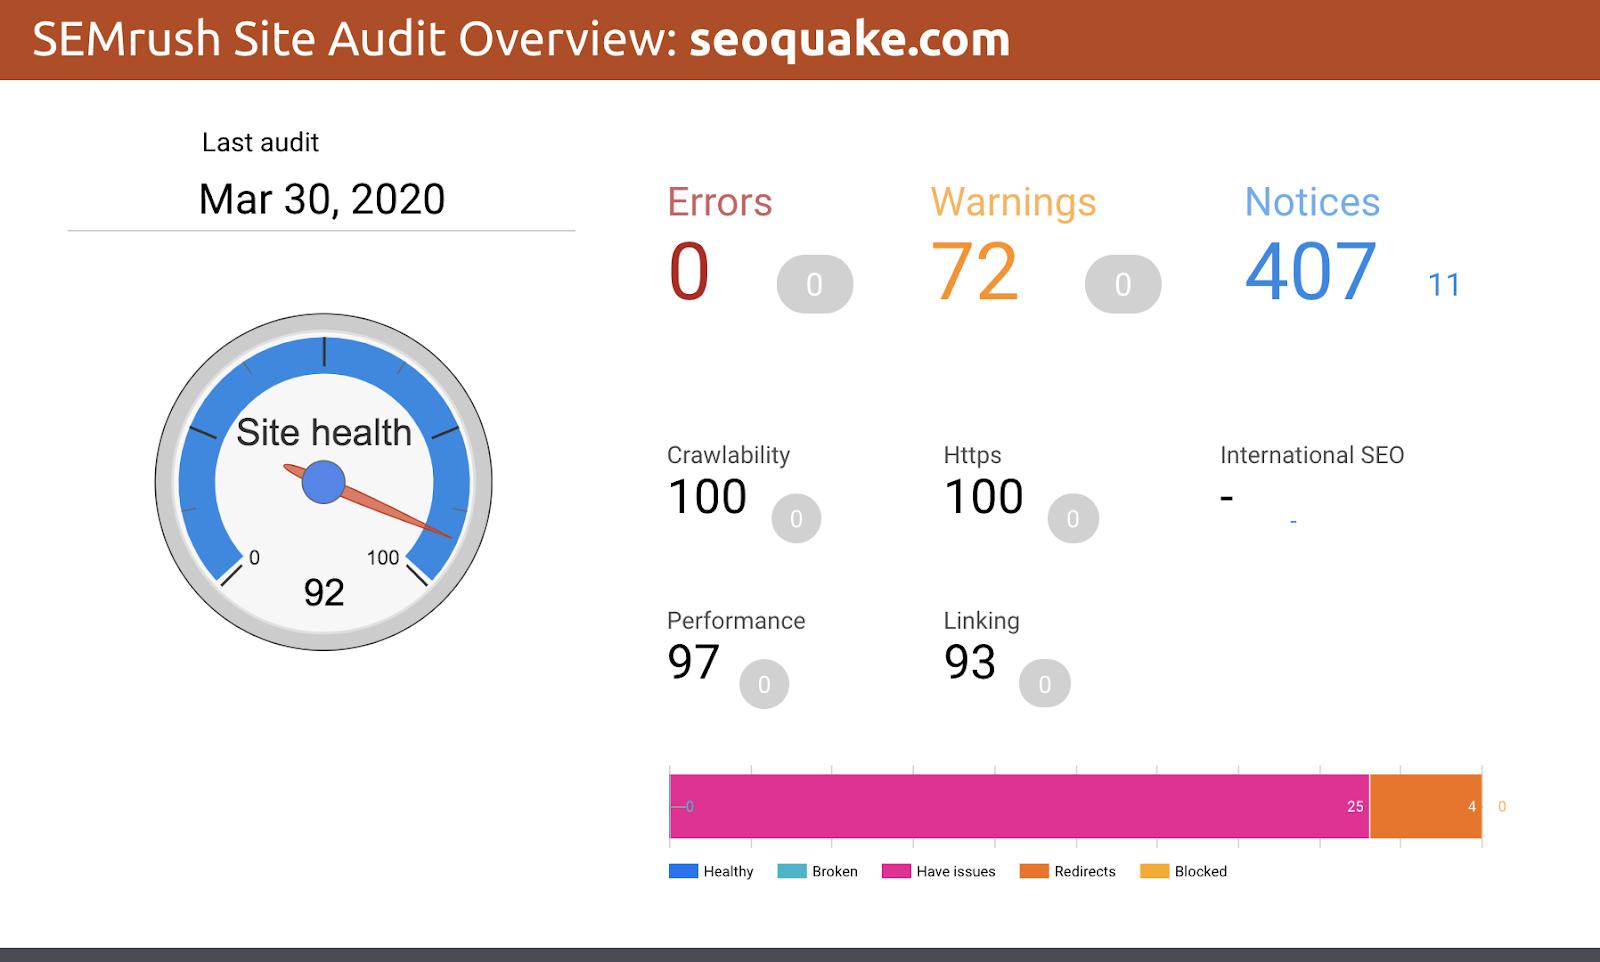 SEMrush Site Audit Overview